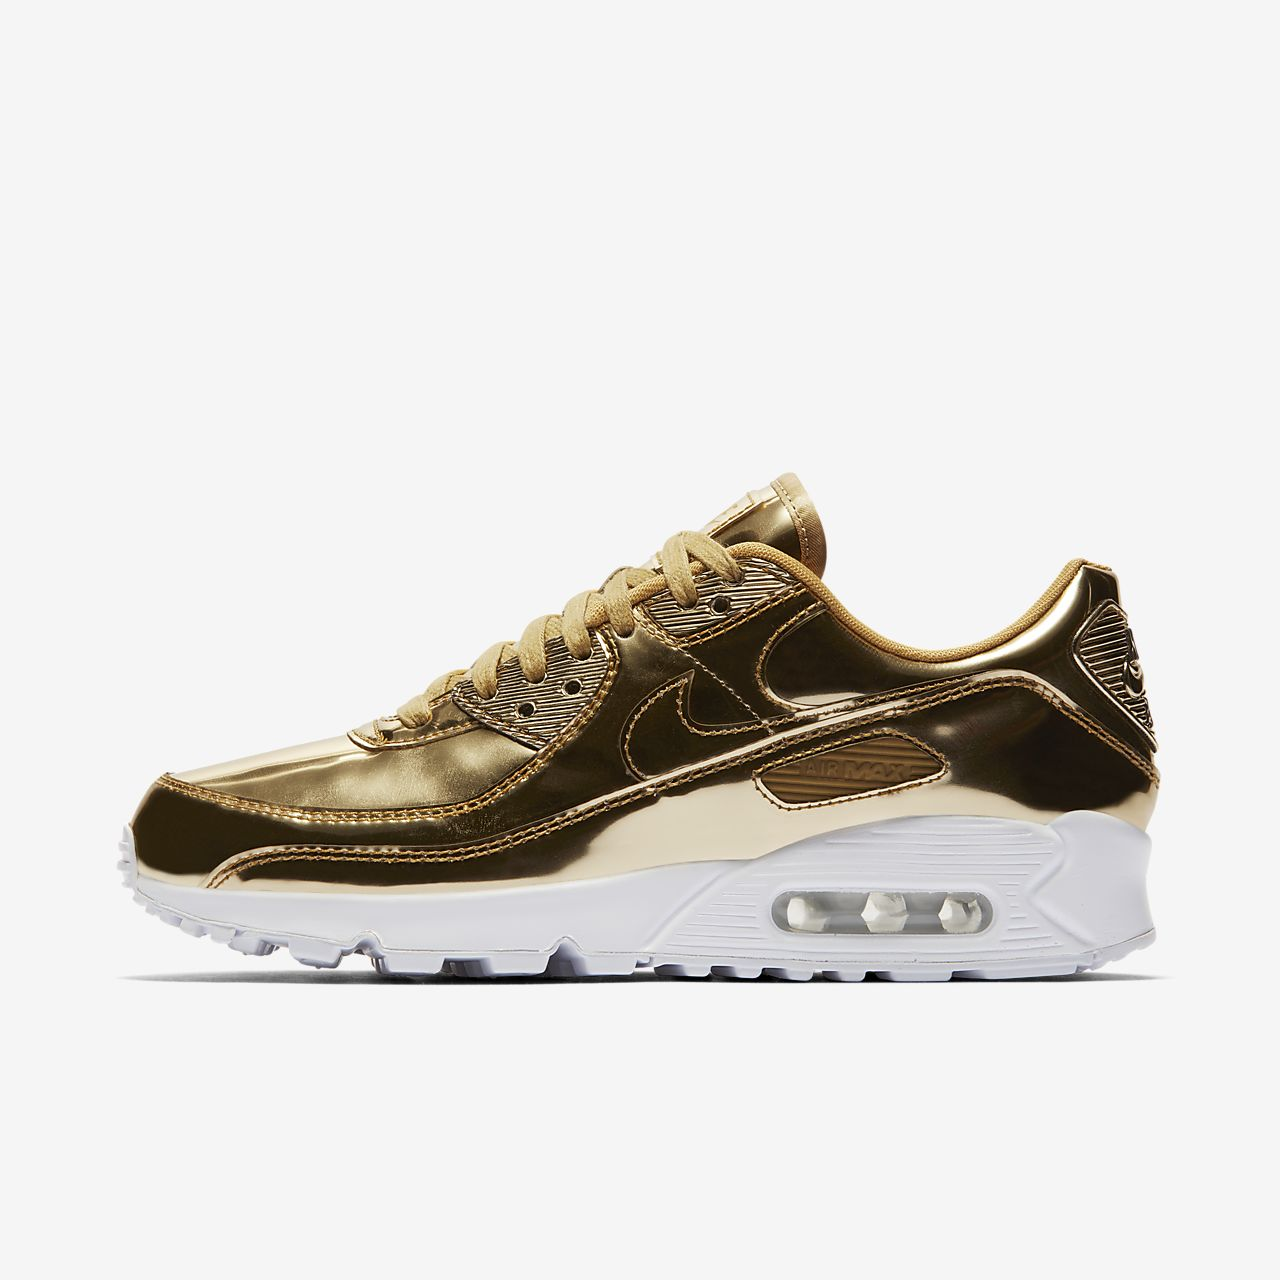 Nike Air Max 90 SP Schuh